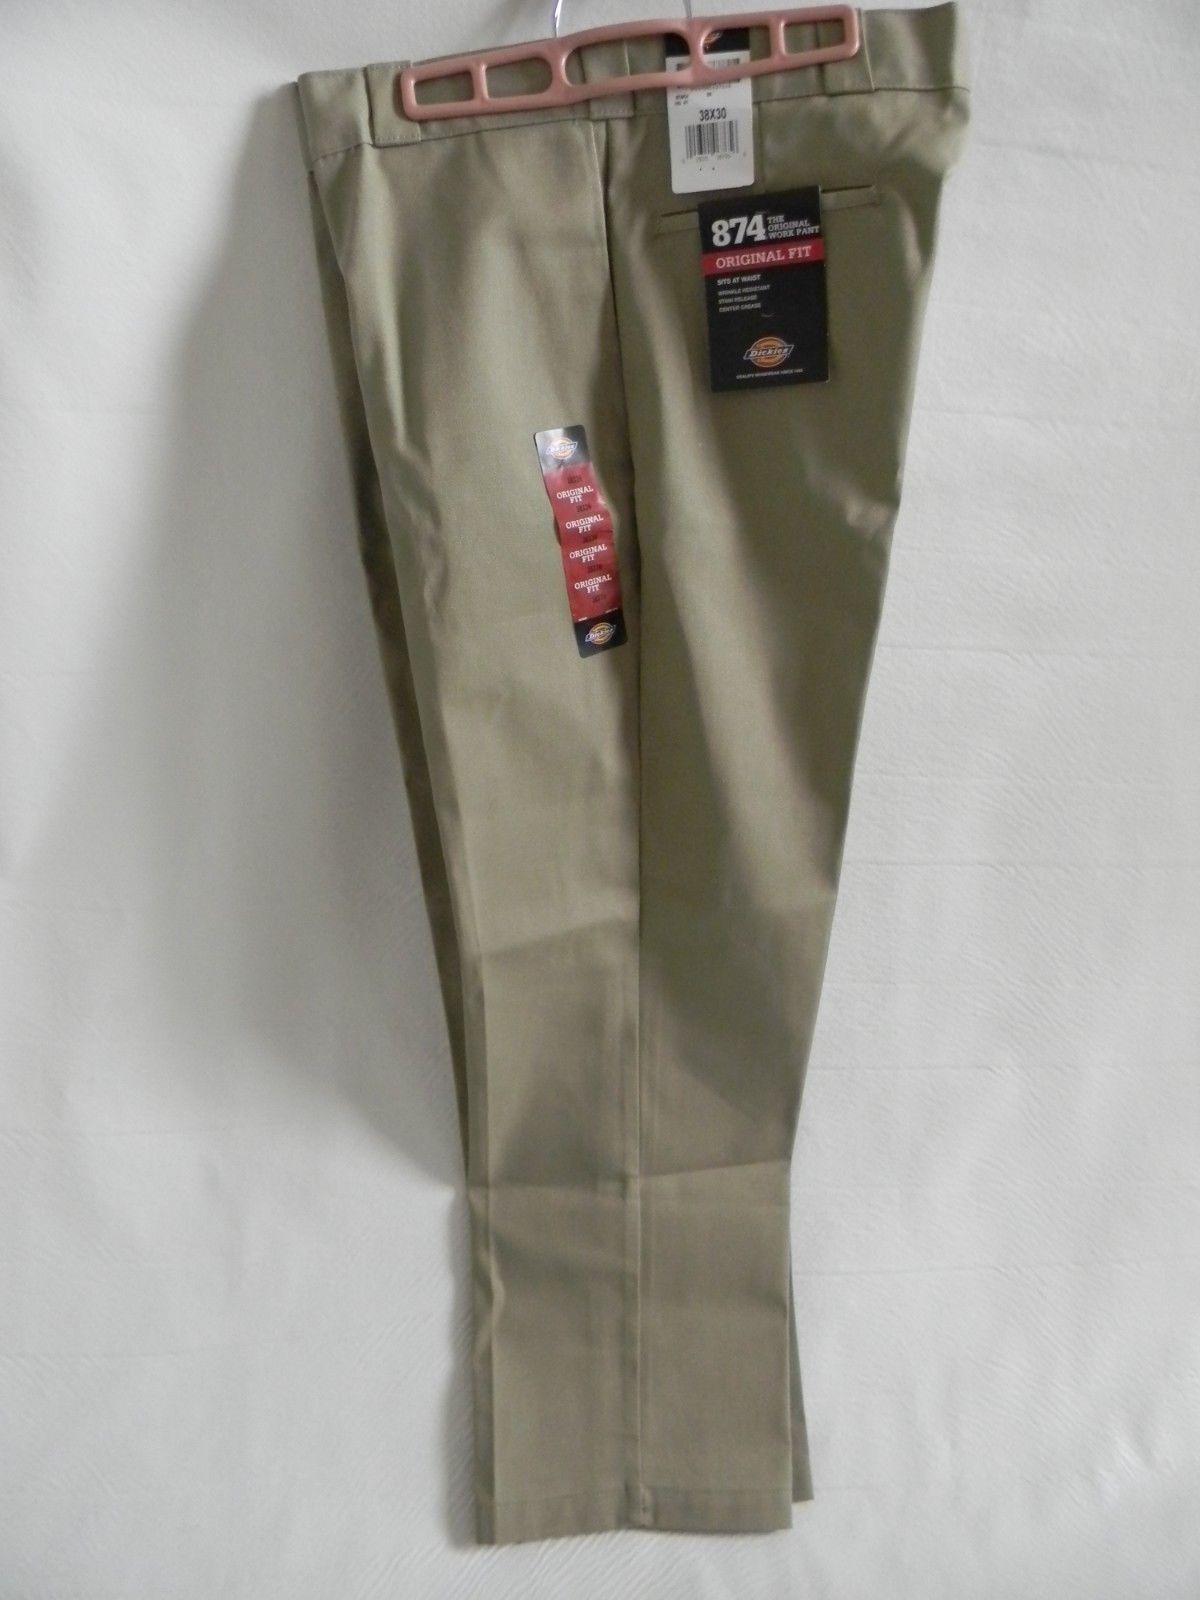 NWT Dickies Tan 874 The Original Work Pant, Size 38 X 30 - $23.99